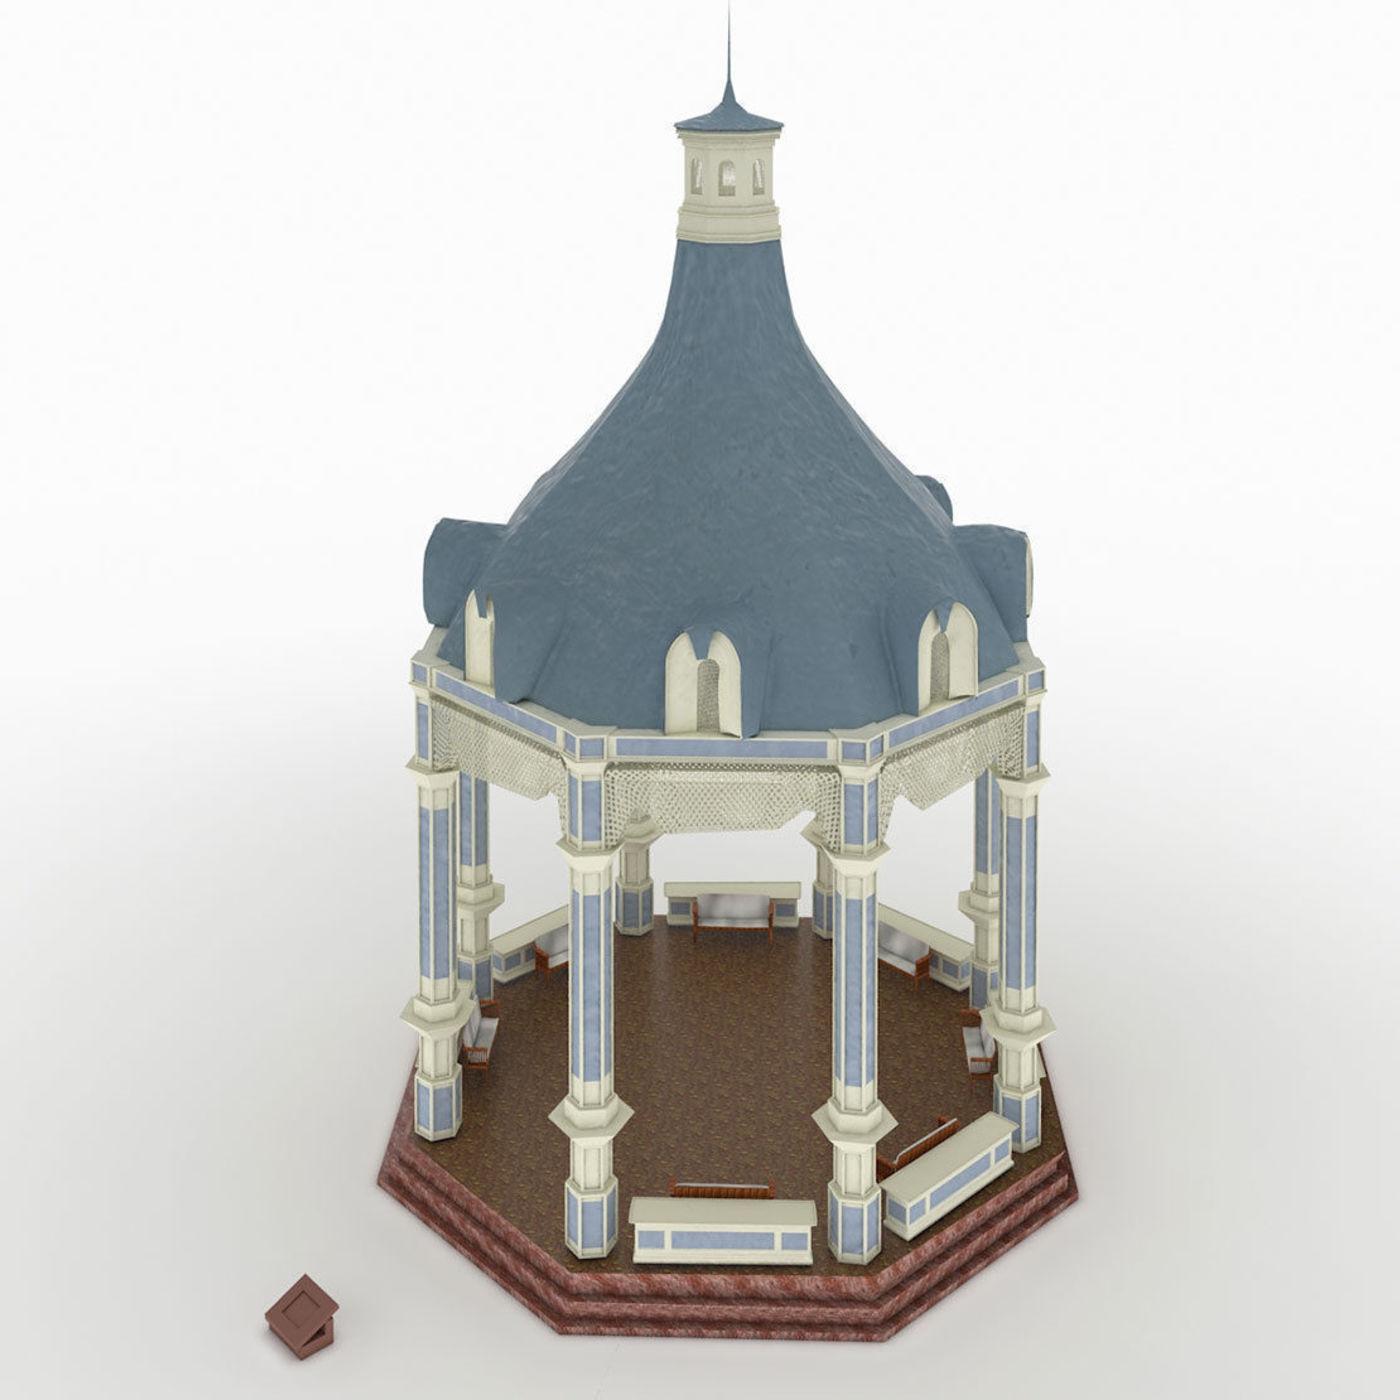 Victorian gazebo model